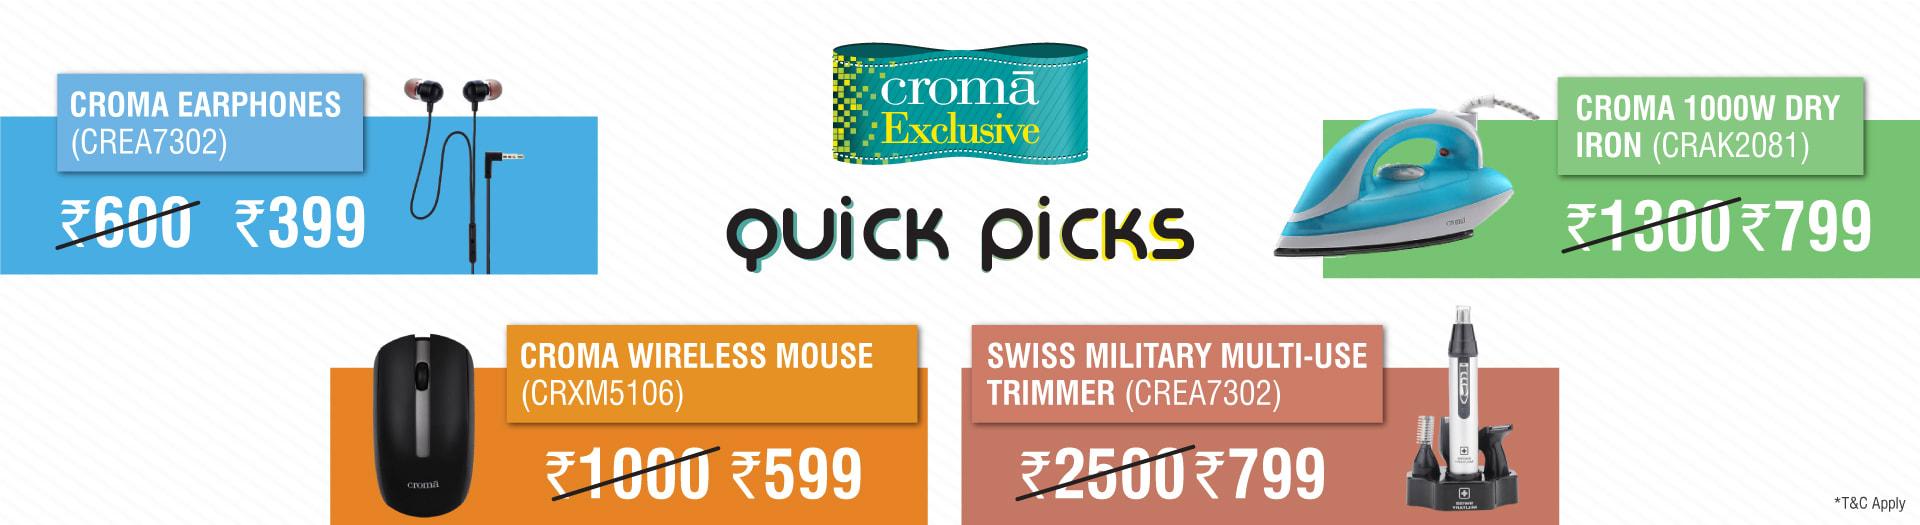 Croma Quick Picks